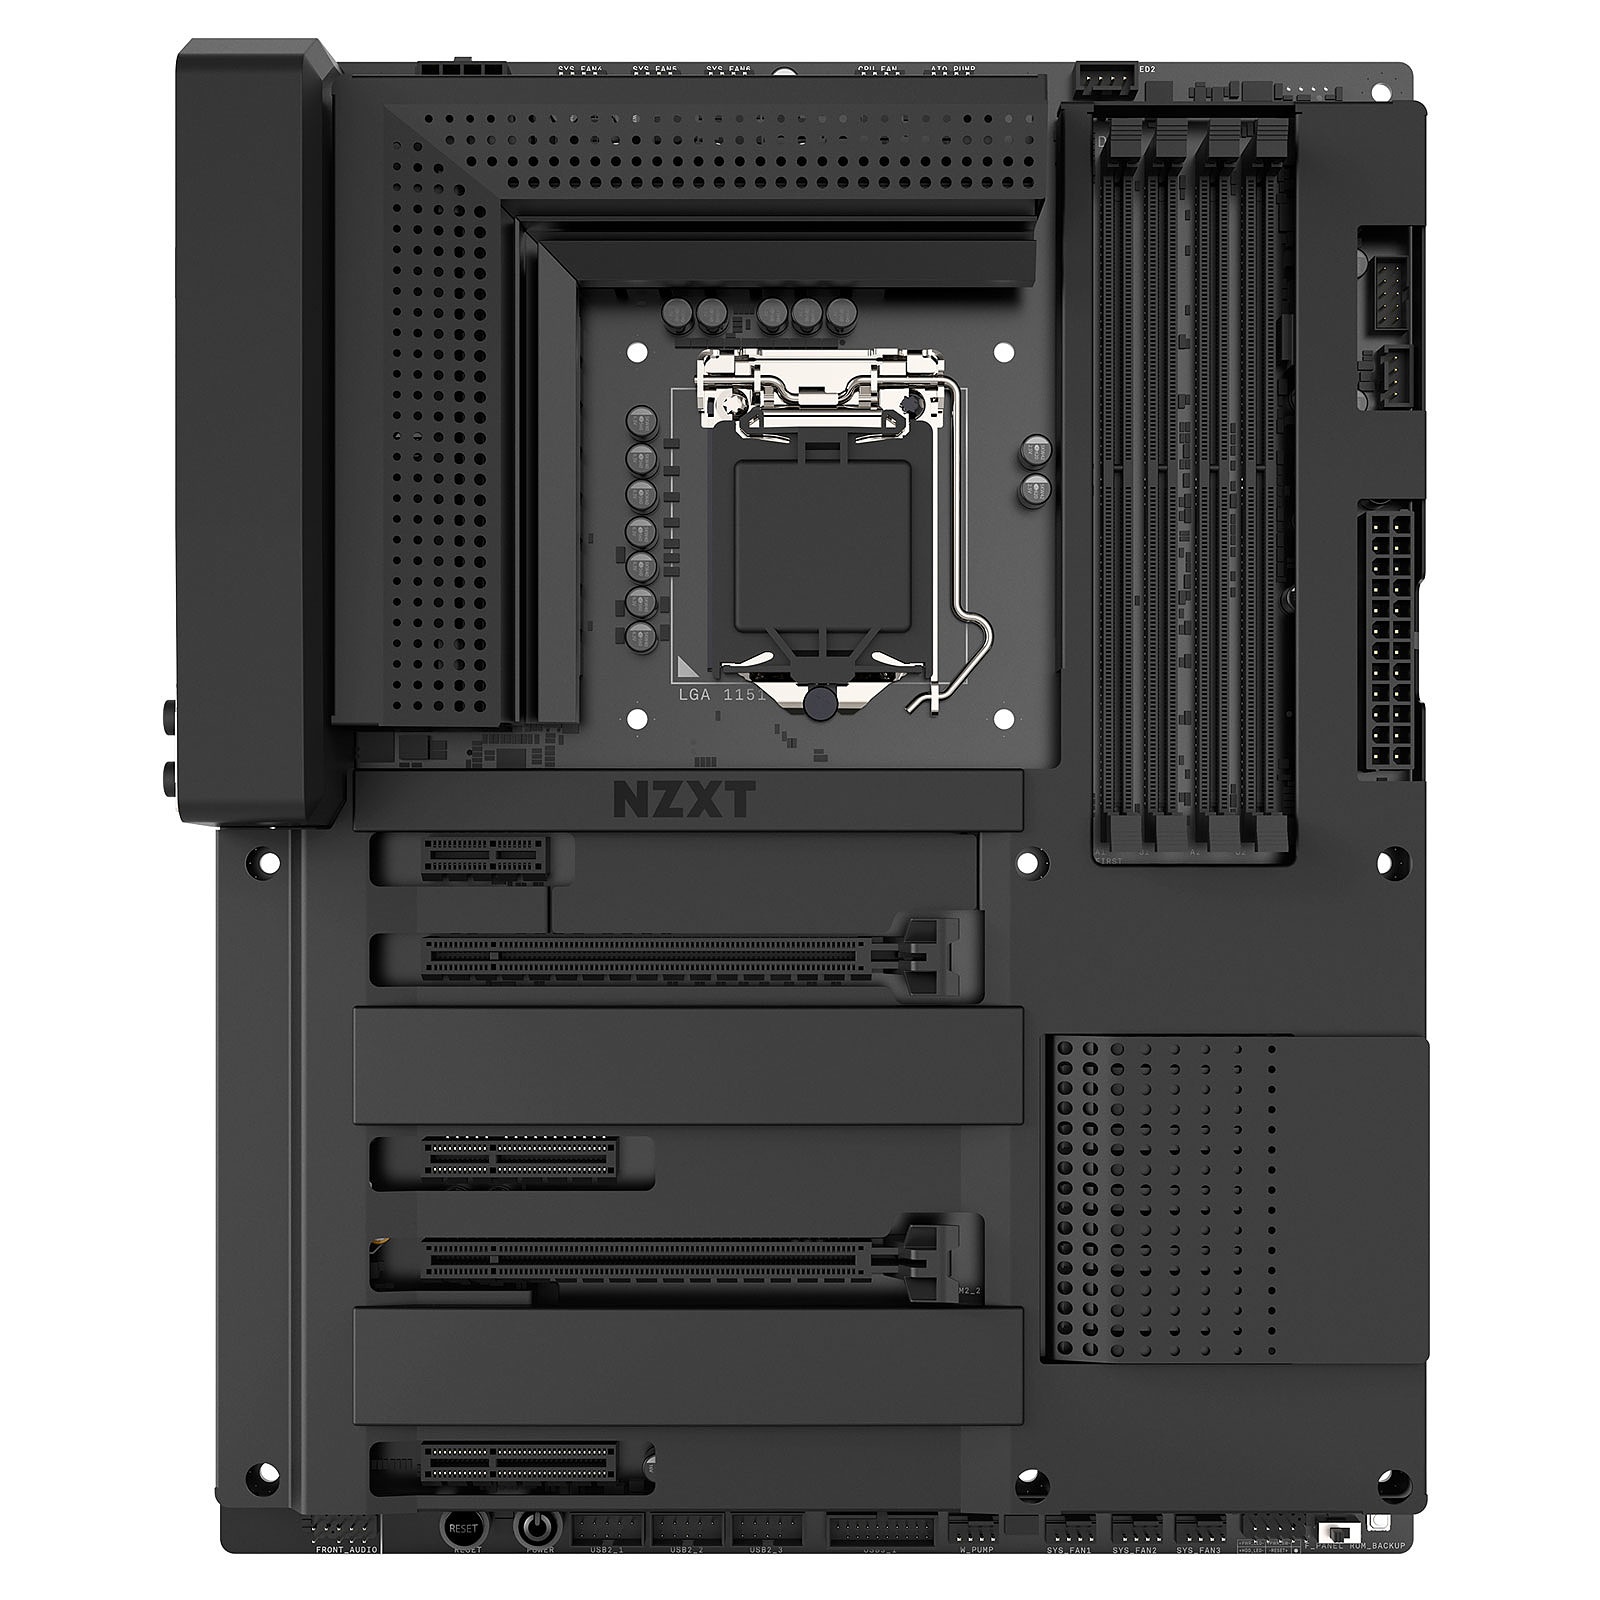 NZXT N7 Z370 - Negro